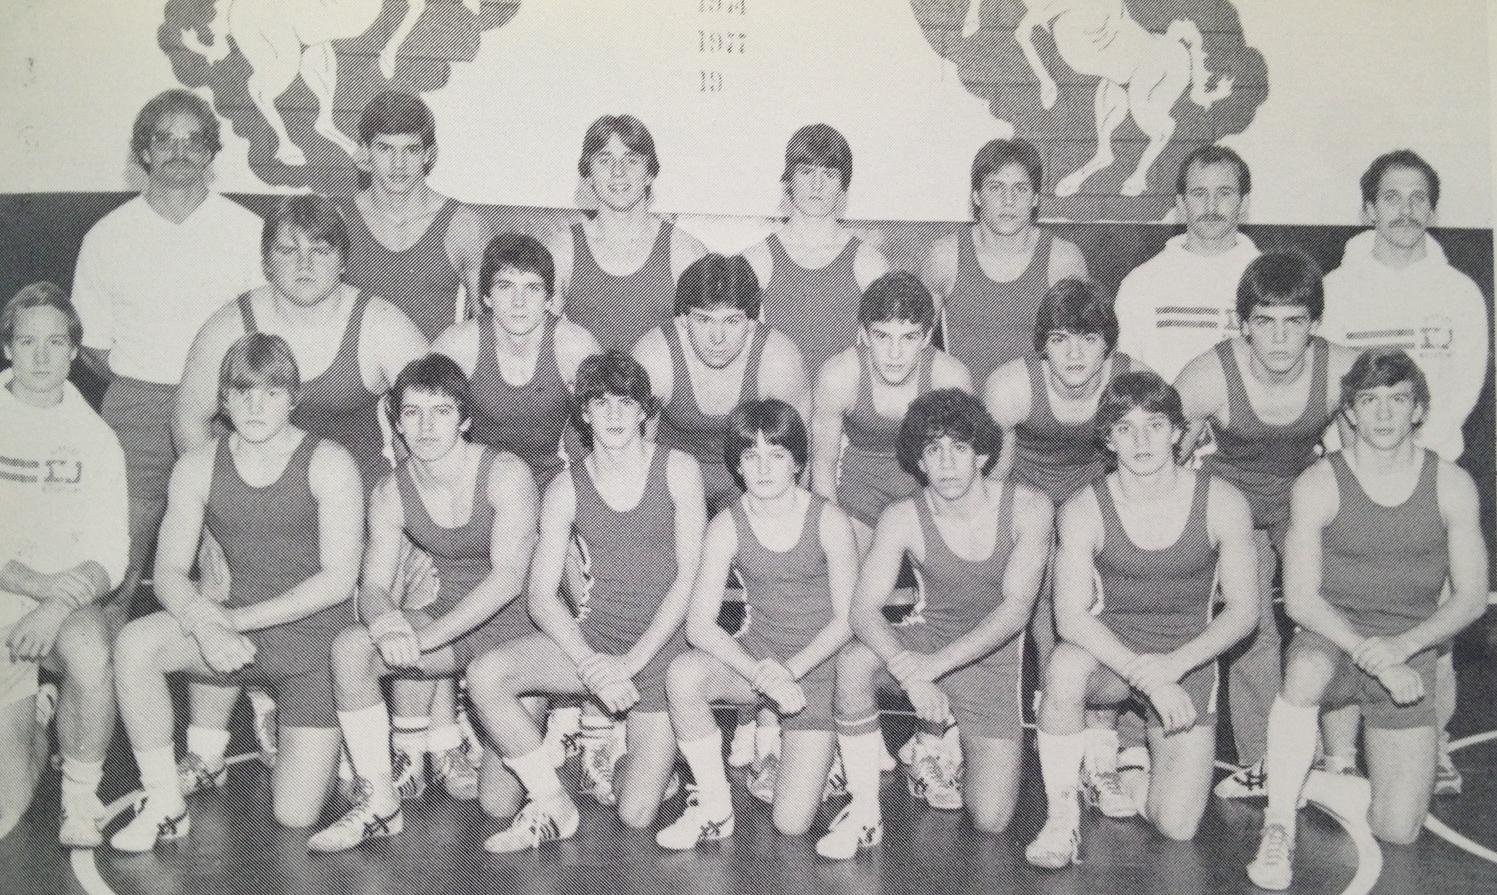 1983 District Champions